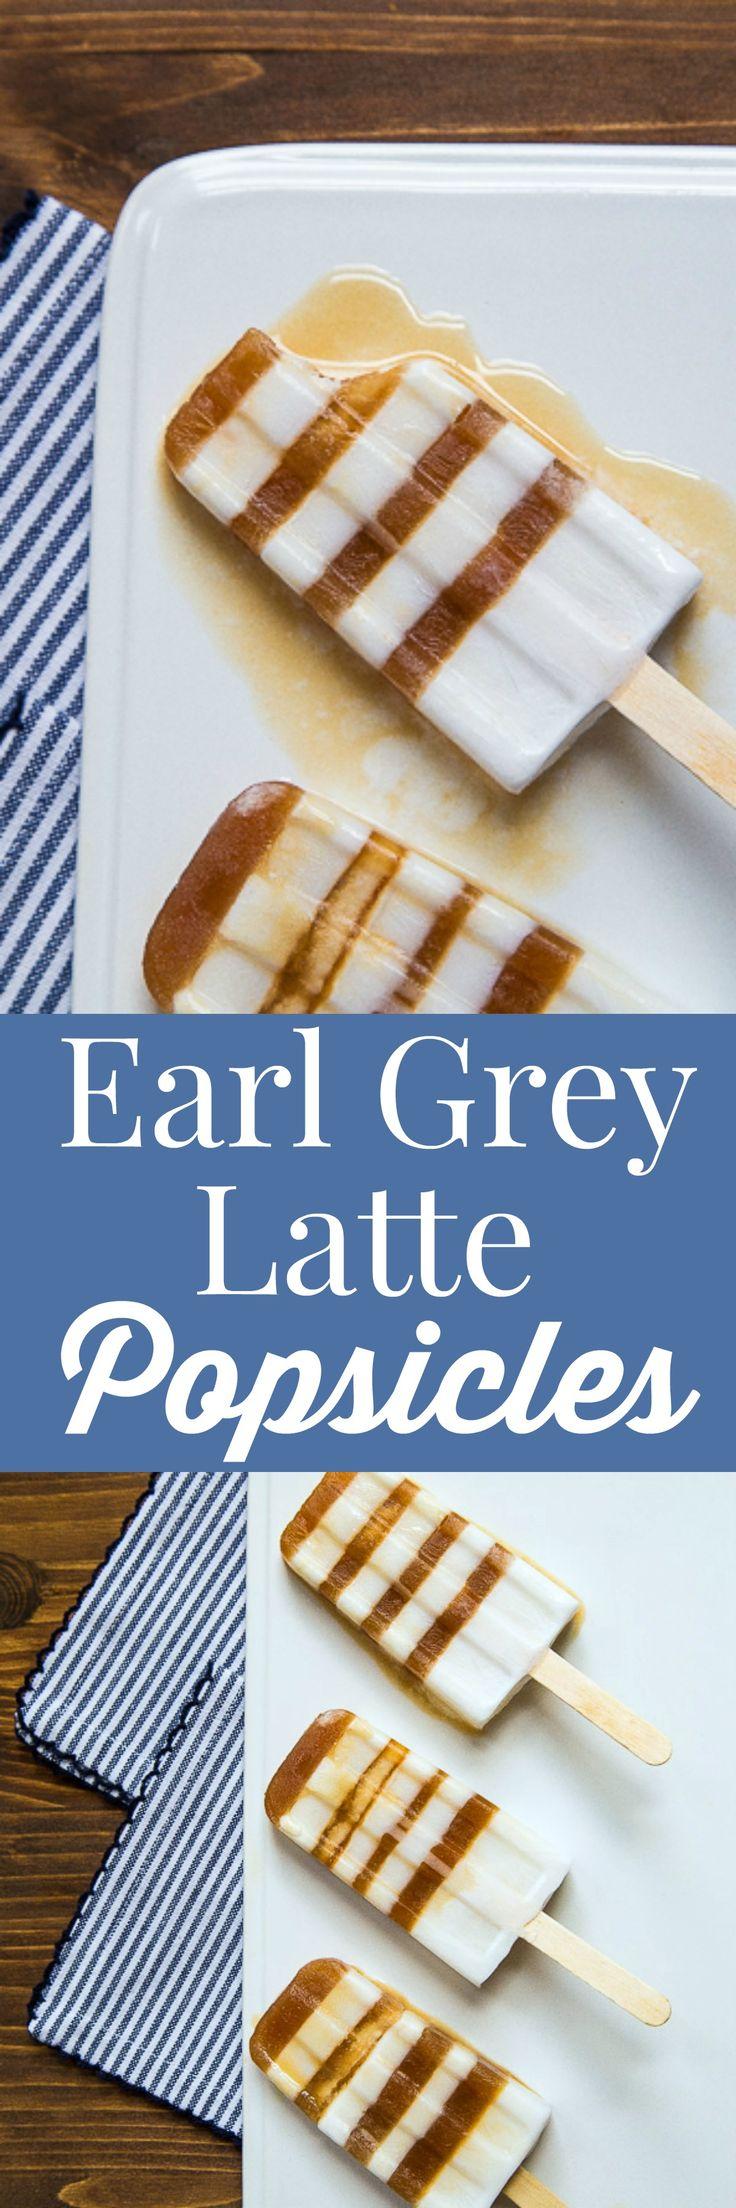 Starbucks copycat London Fog (Earl Grey Tea Latte) made into popsicles. Easy breakfast to go!